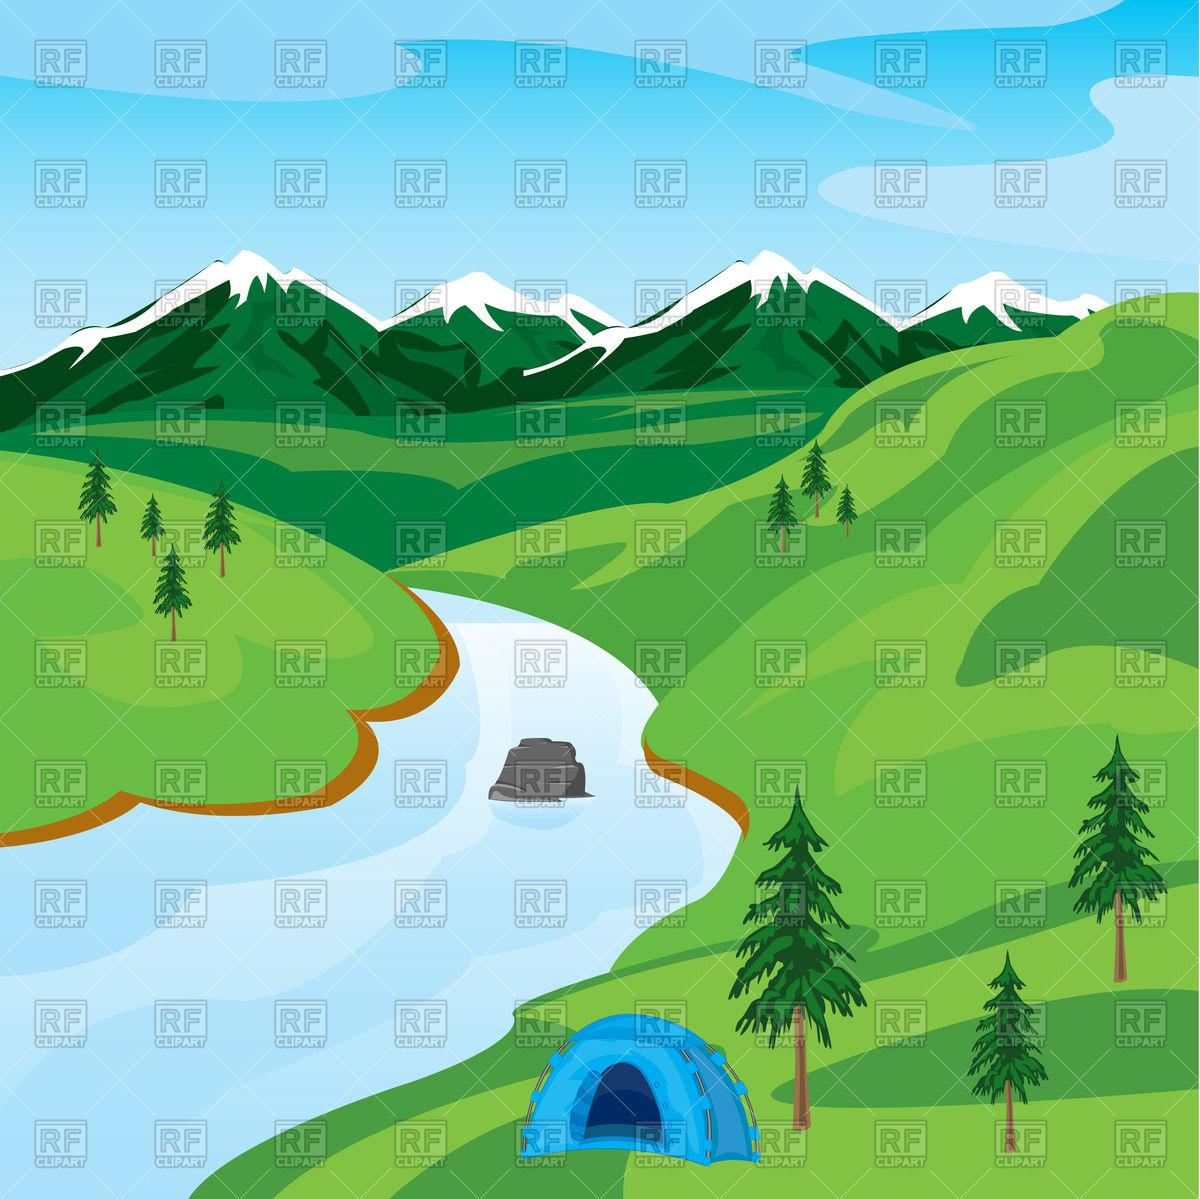 Clip Art River Clipart river pictures clip art clipartfox mountain art